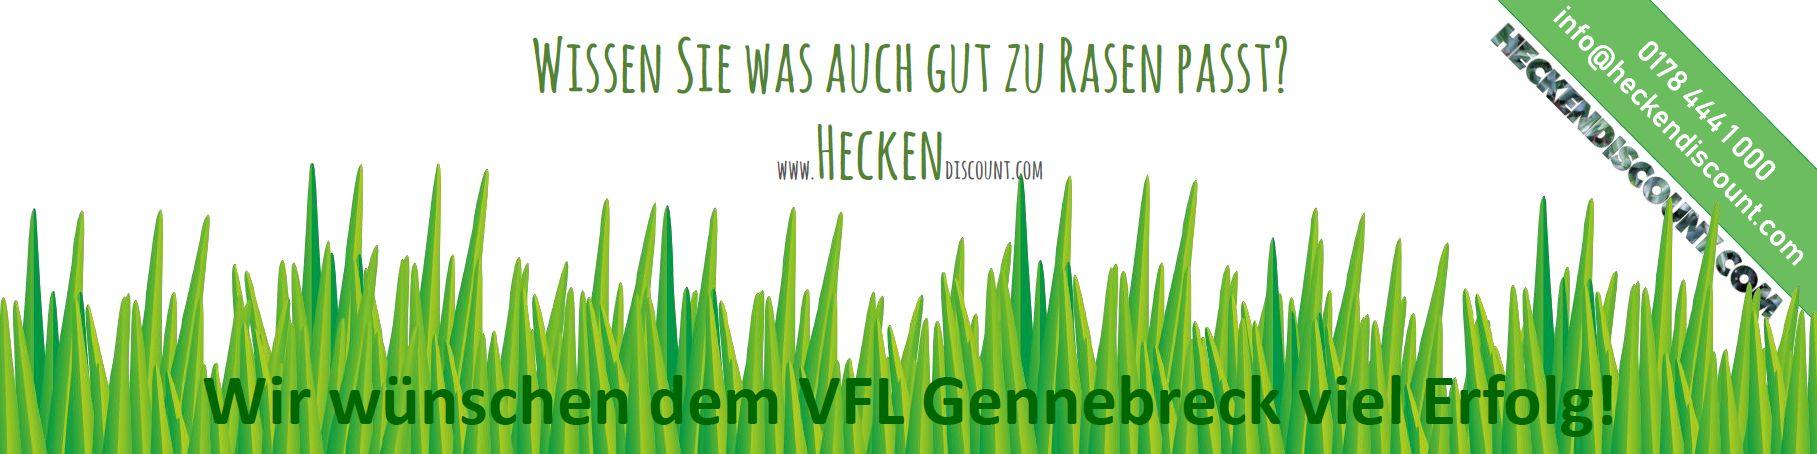 Heckendiscount.com